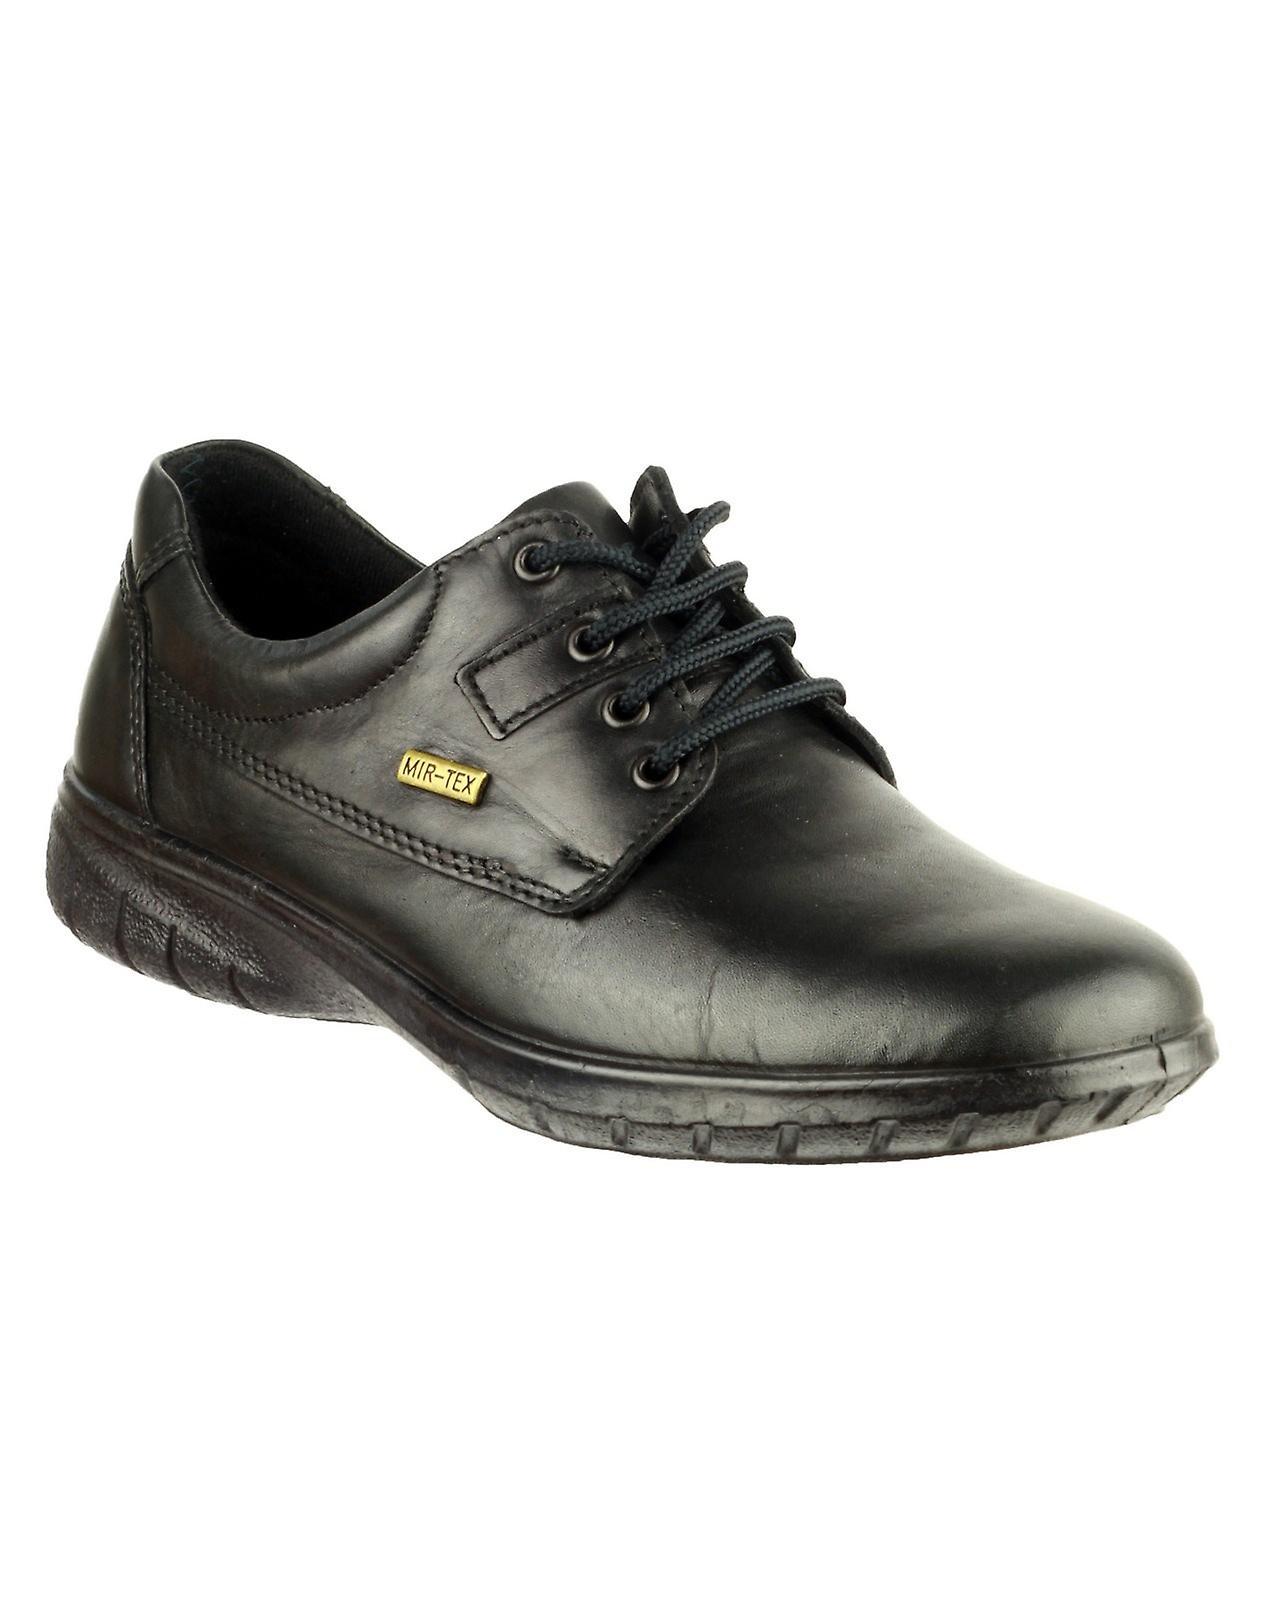 Cotswold Ruscombe Waterproof Shoe